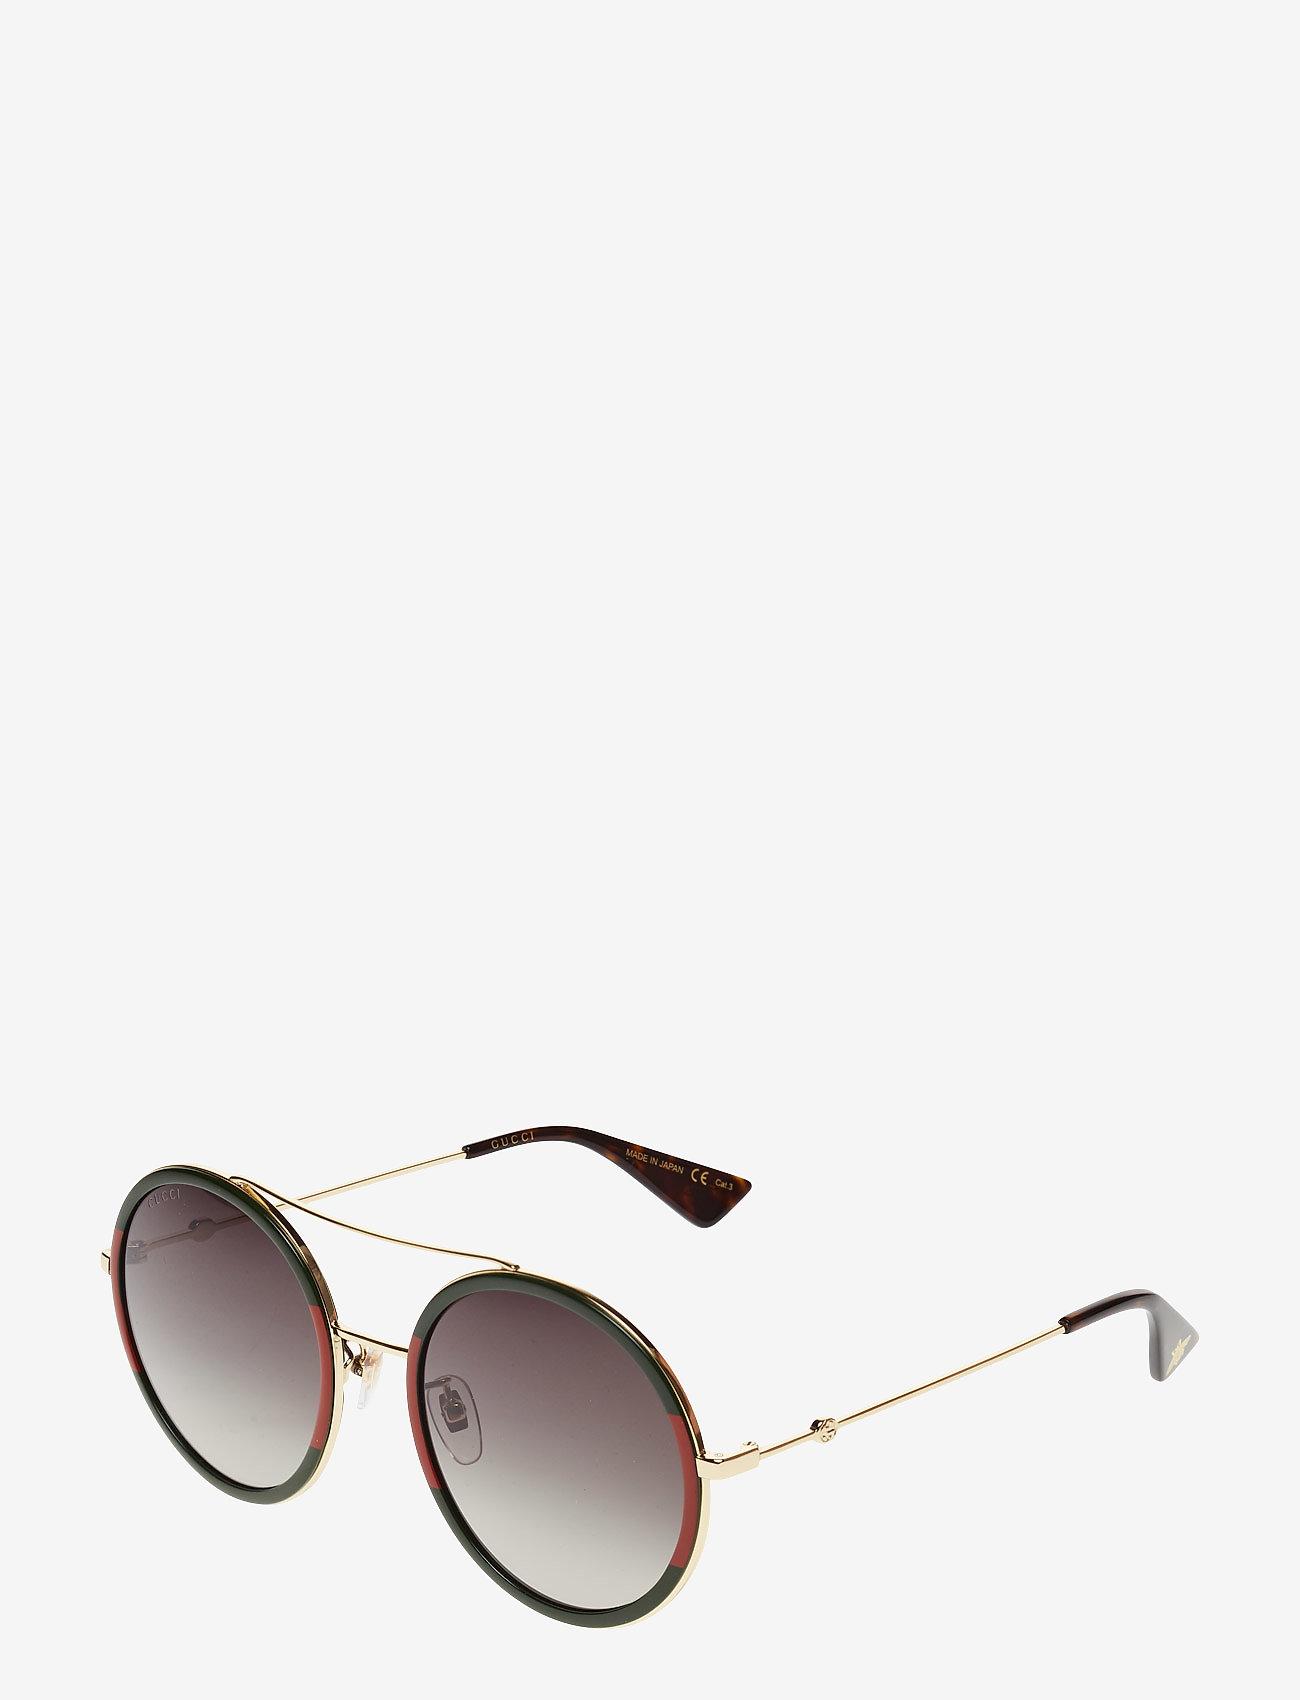 Gucci Sunglasses - GG0061S - rond model - gold-gold-green - 1